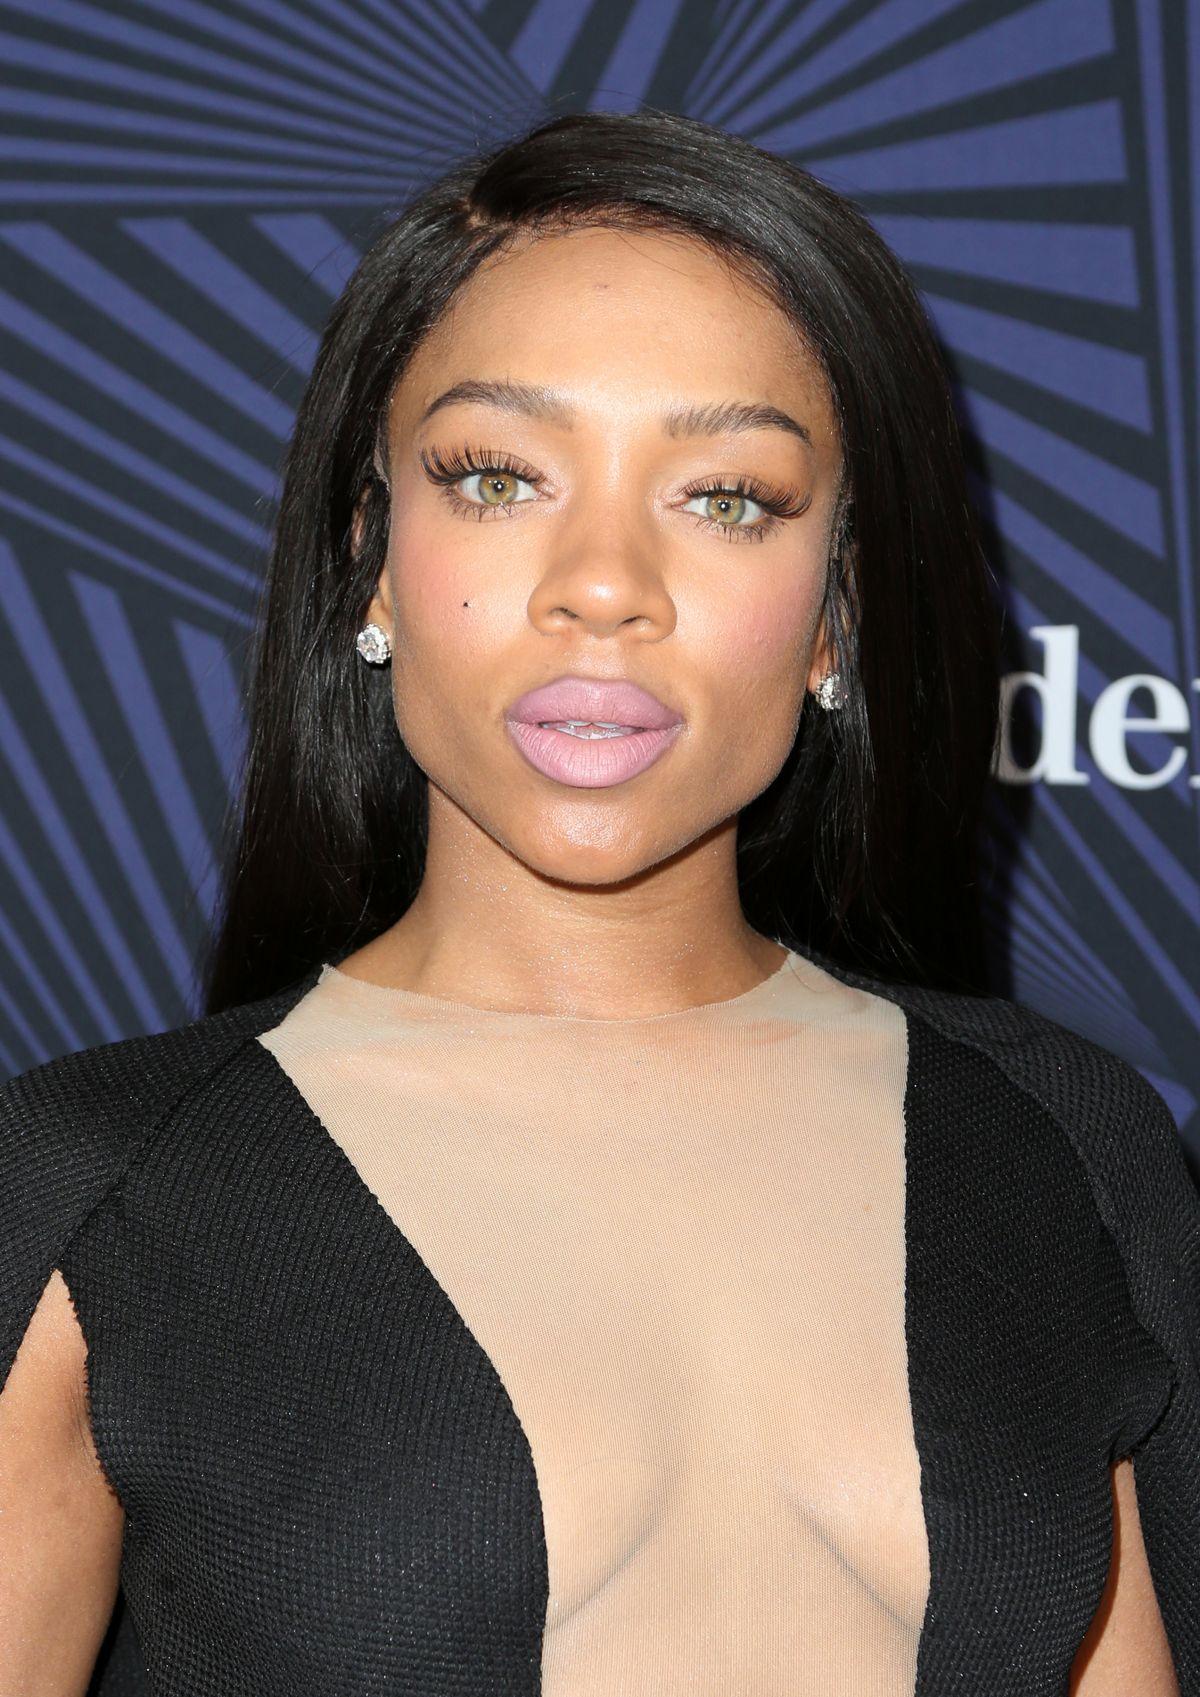 LIL' MAMA at Bet's 2017 American Black Film Festival ...